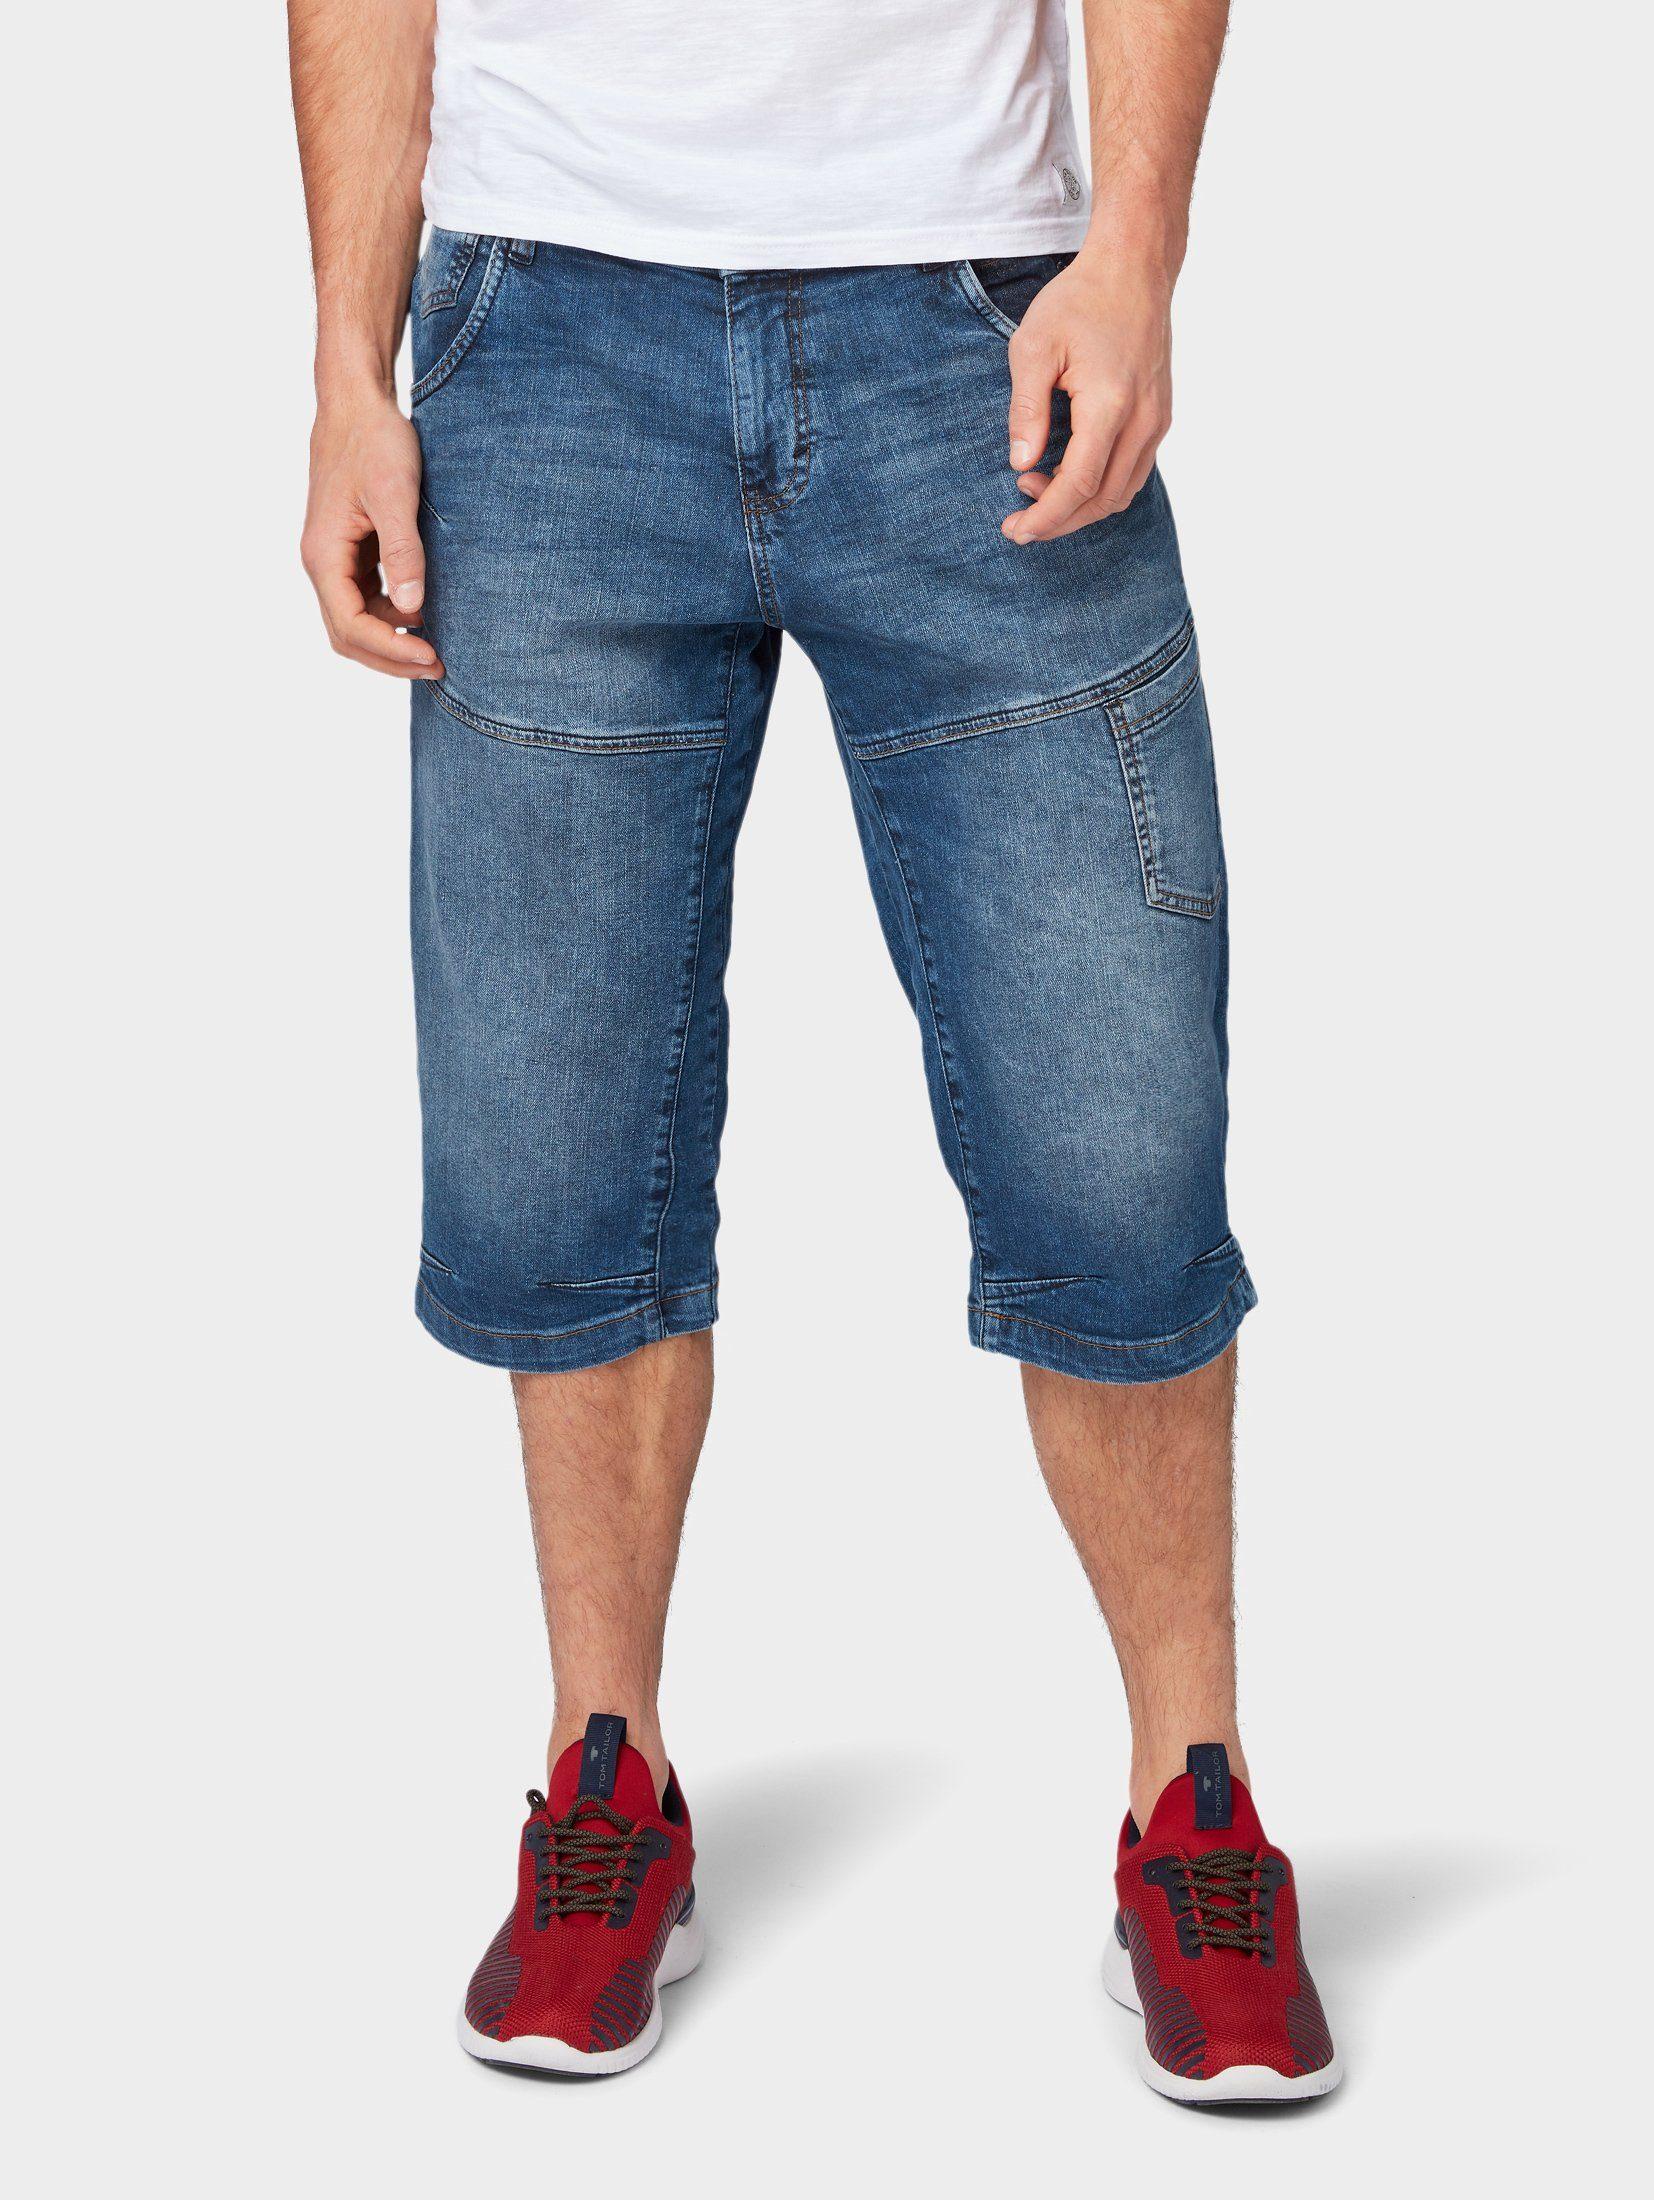 TOM TAILOR 34 Jeans »Max Bermuda Jeans« kaufen | OTTO